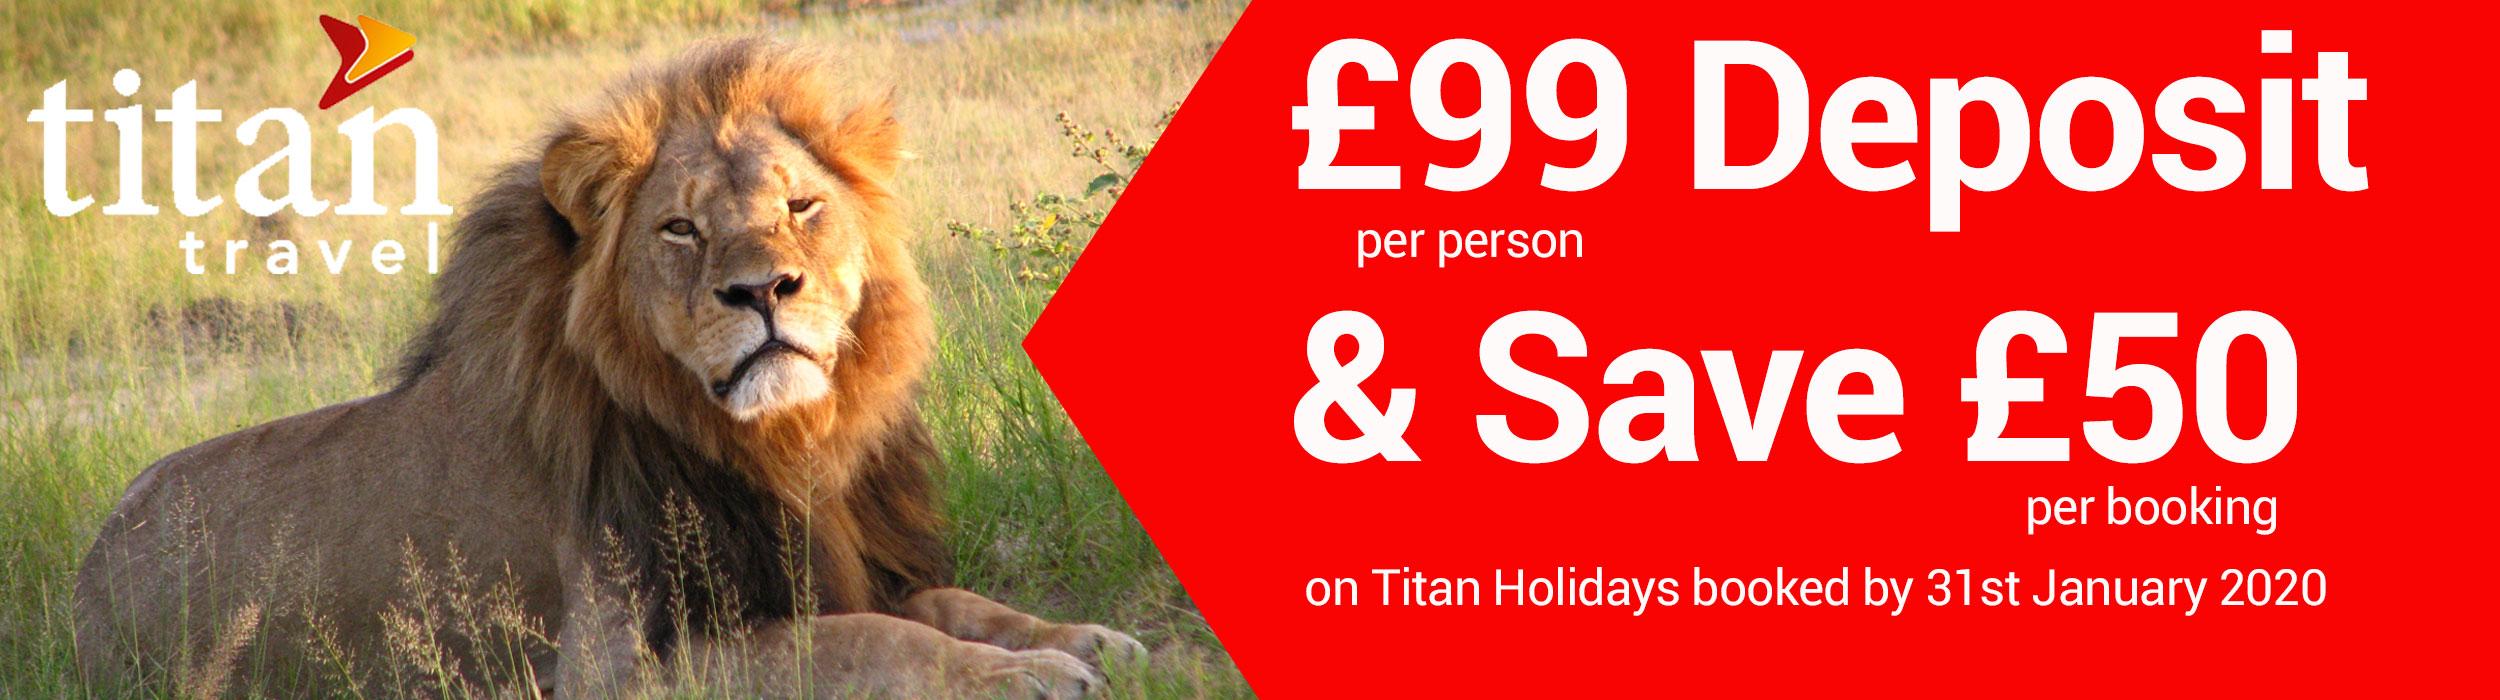 Titan-Travel-Banner